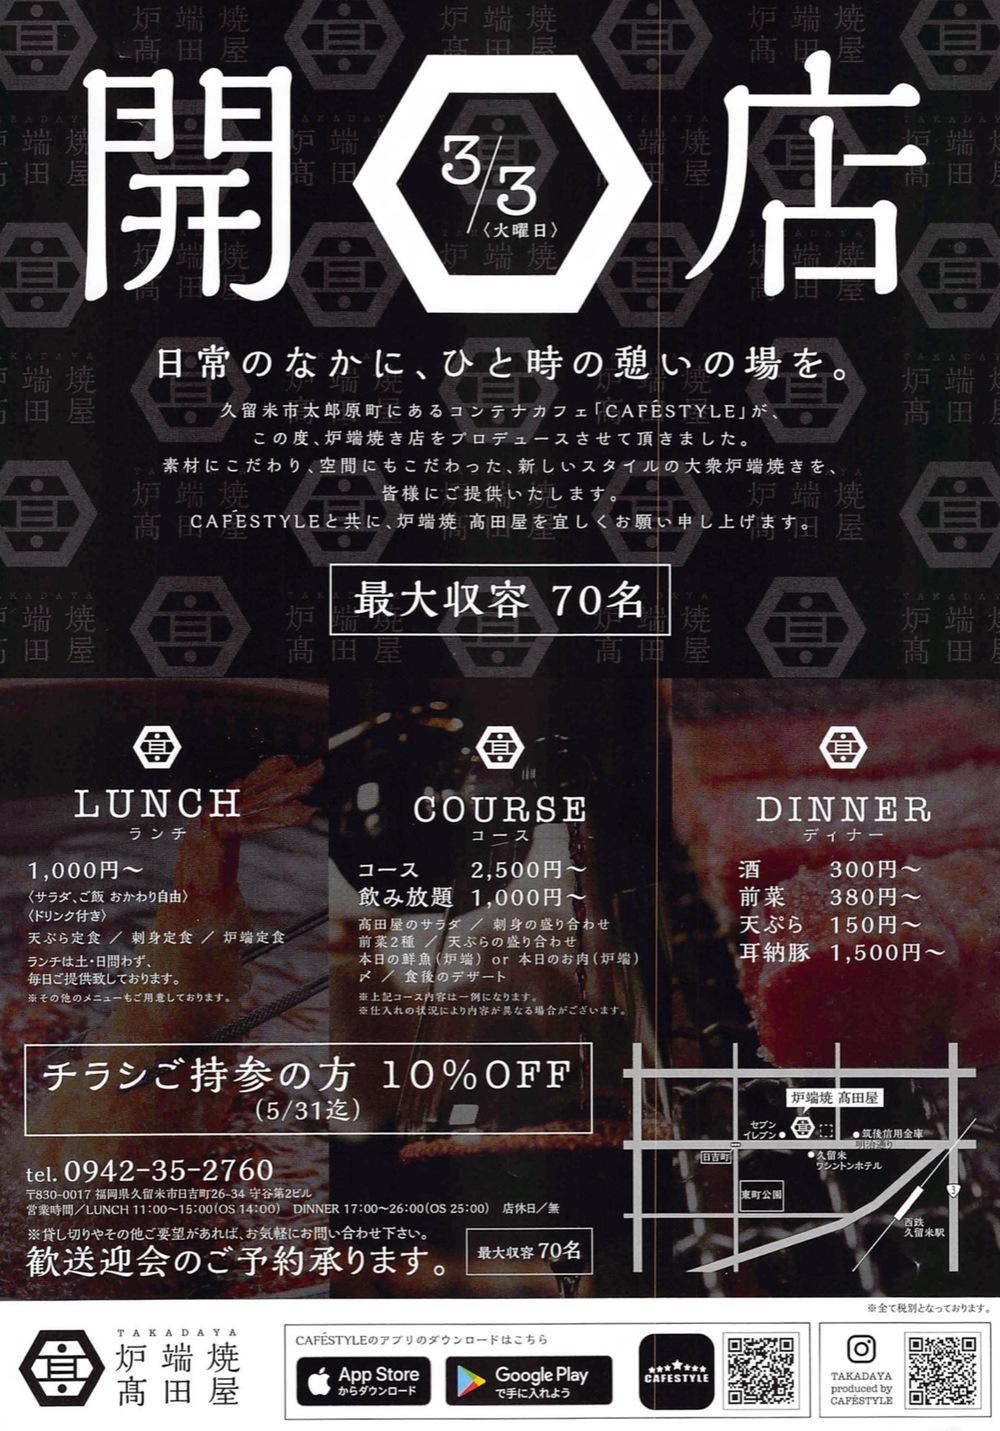 炉端焼 髙田屋 久留米市日吉町に3月3日オープン